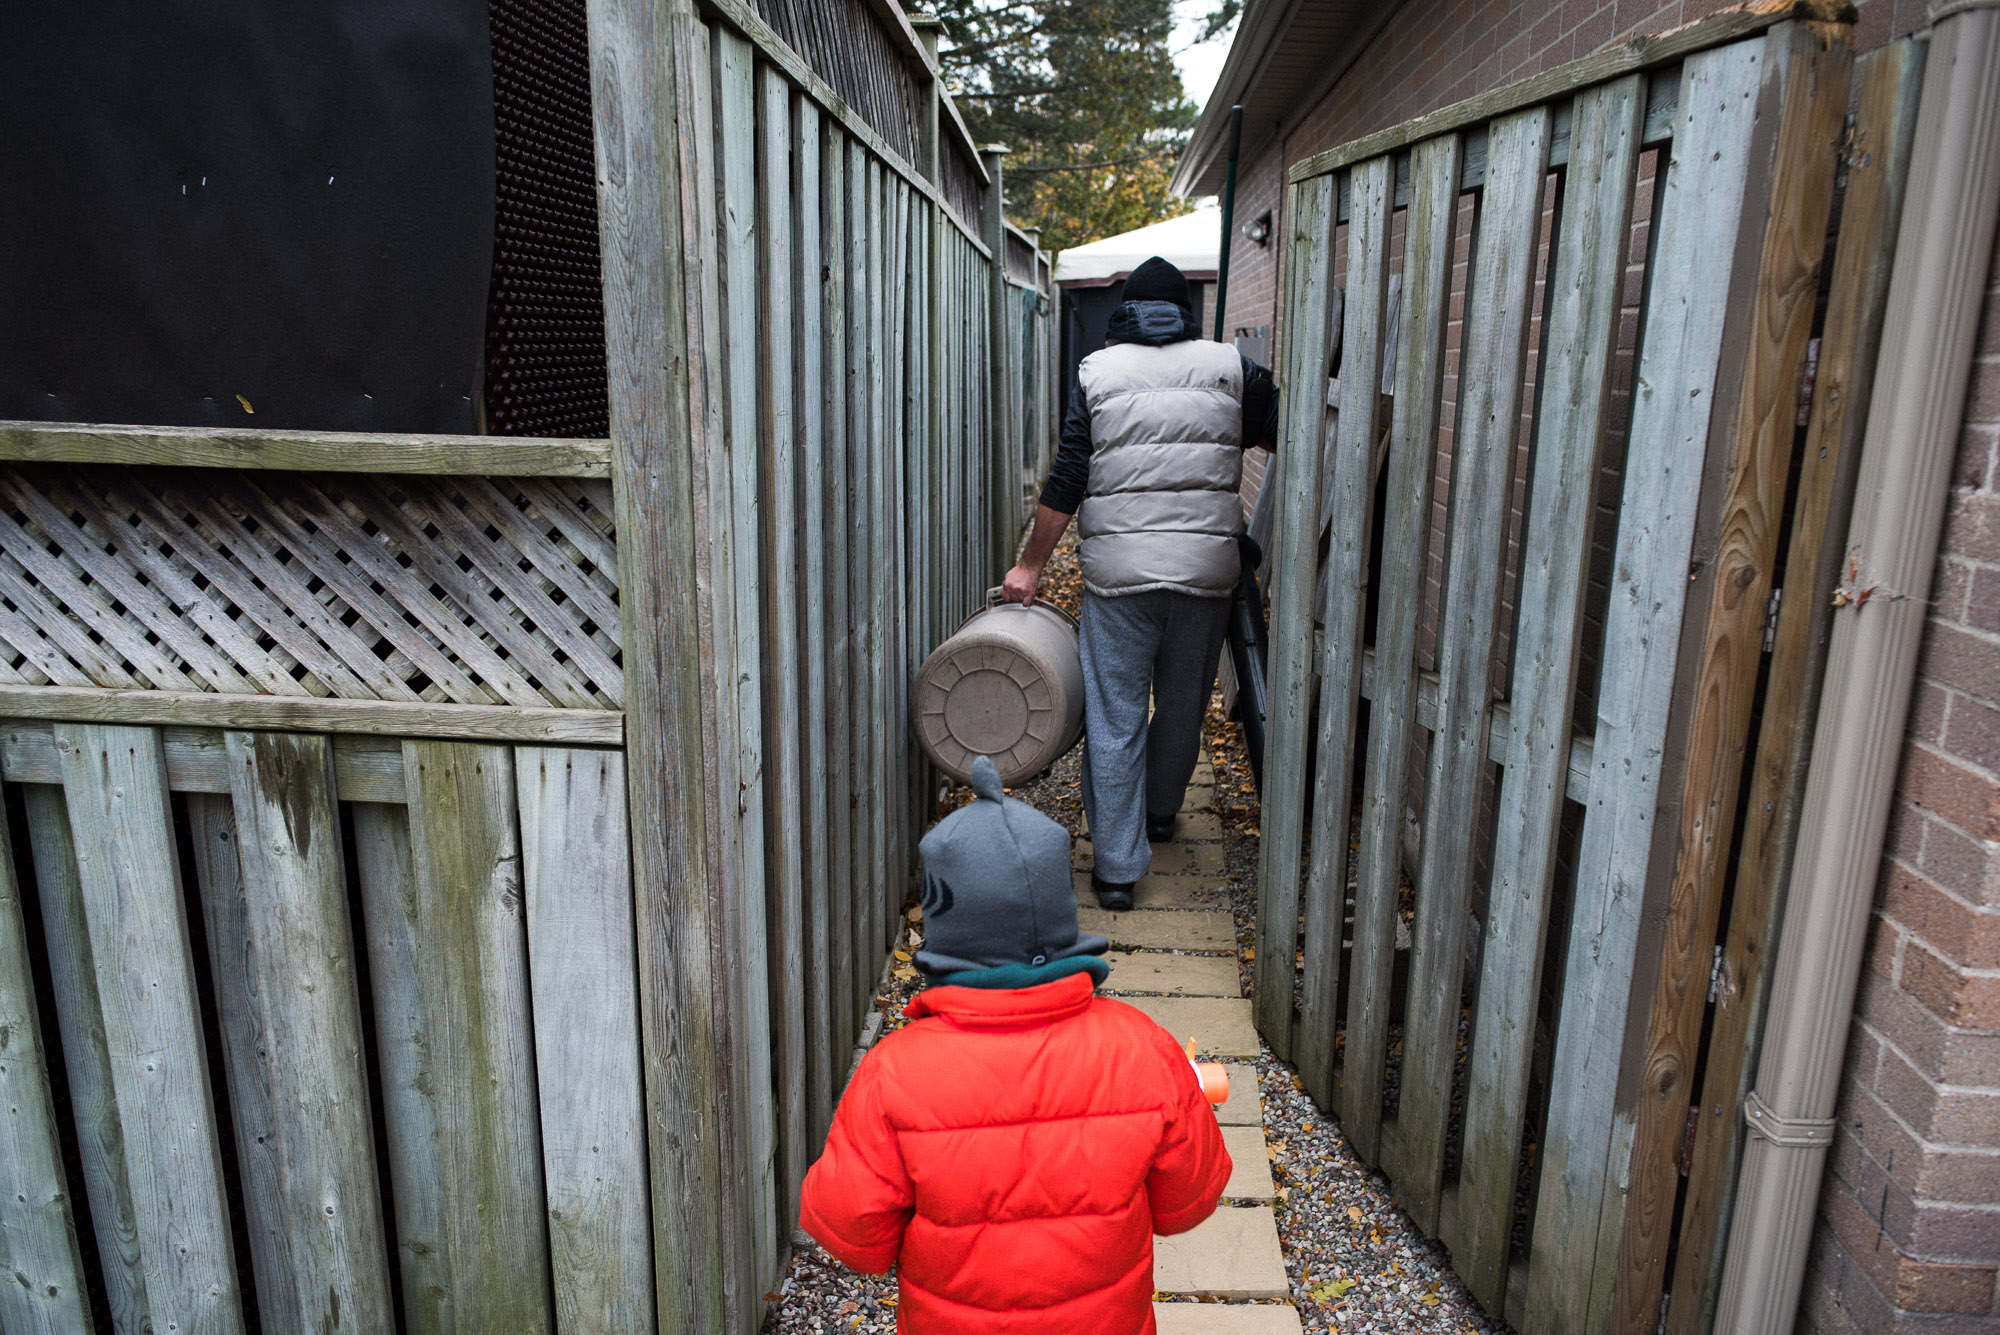 boy in orange coat follows dad to the back yard